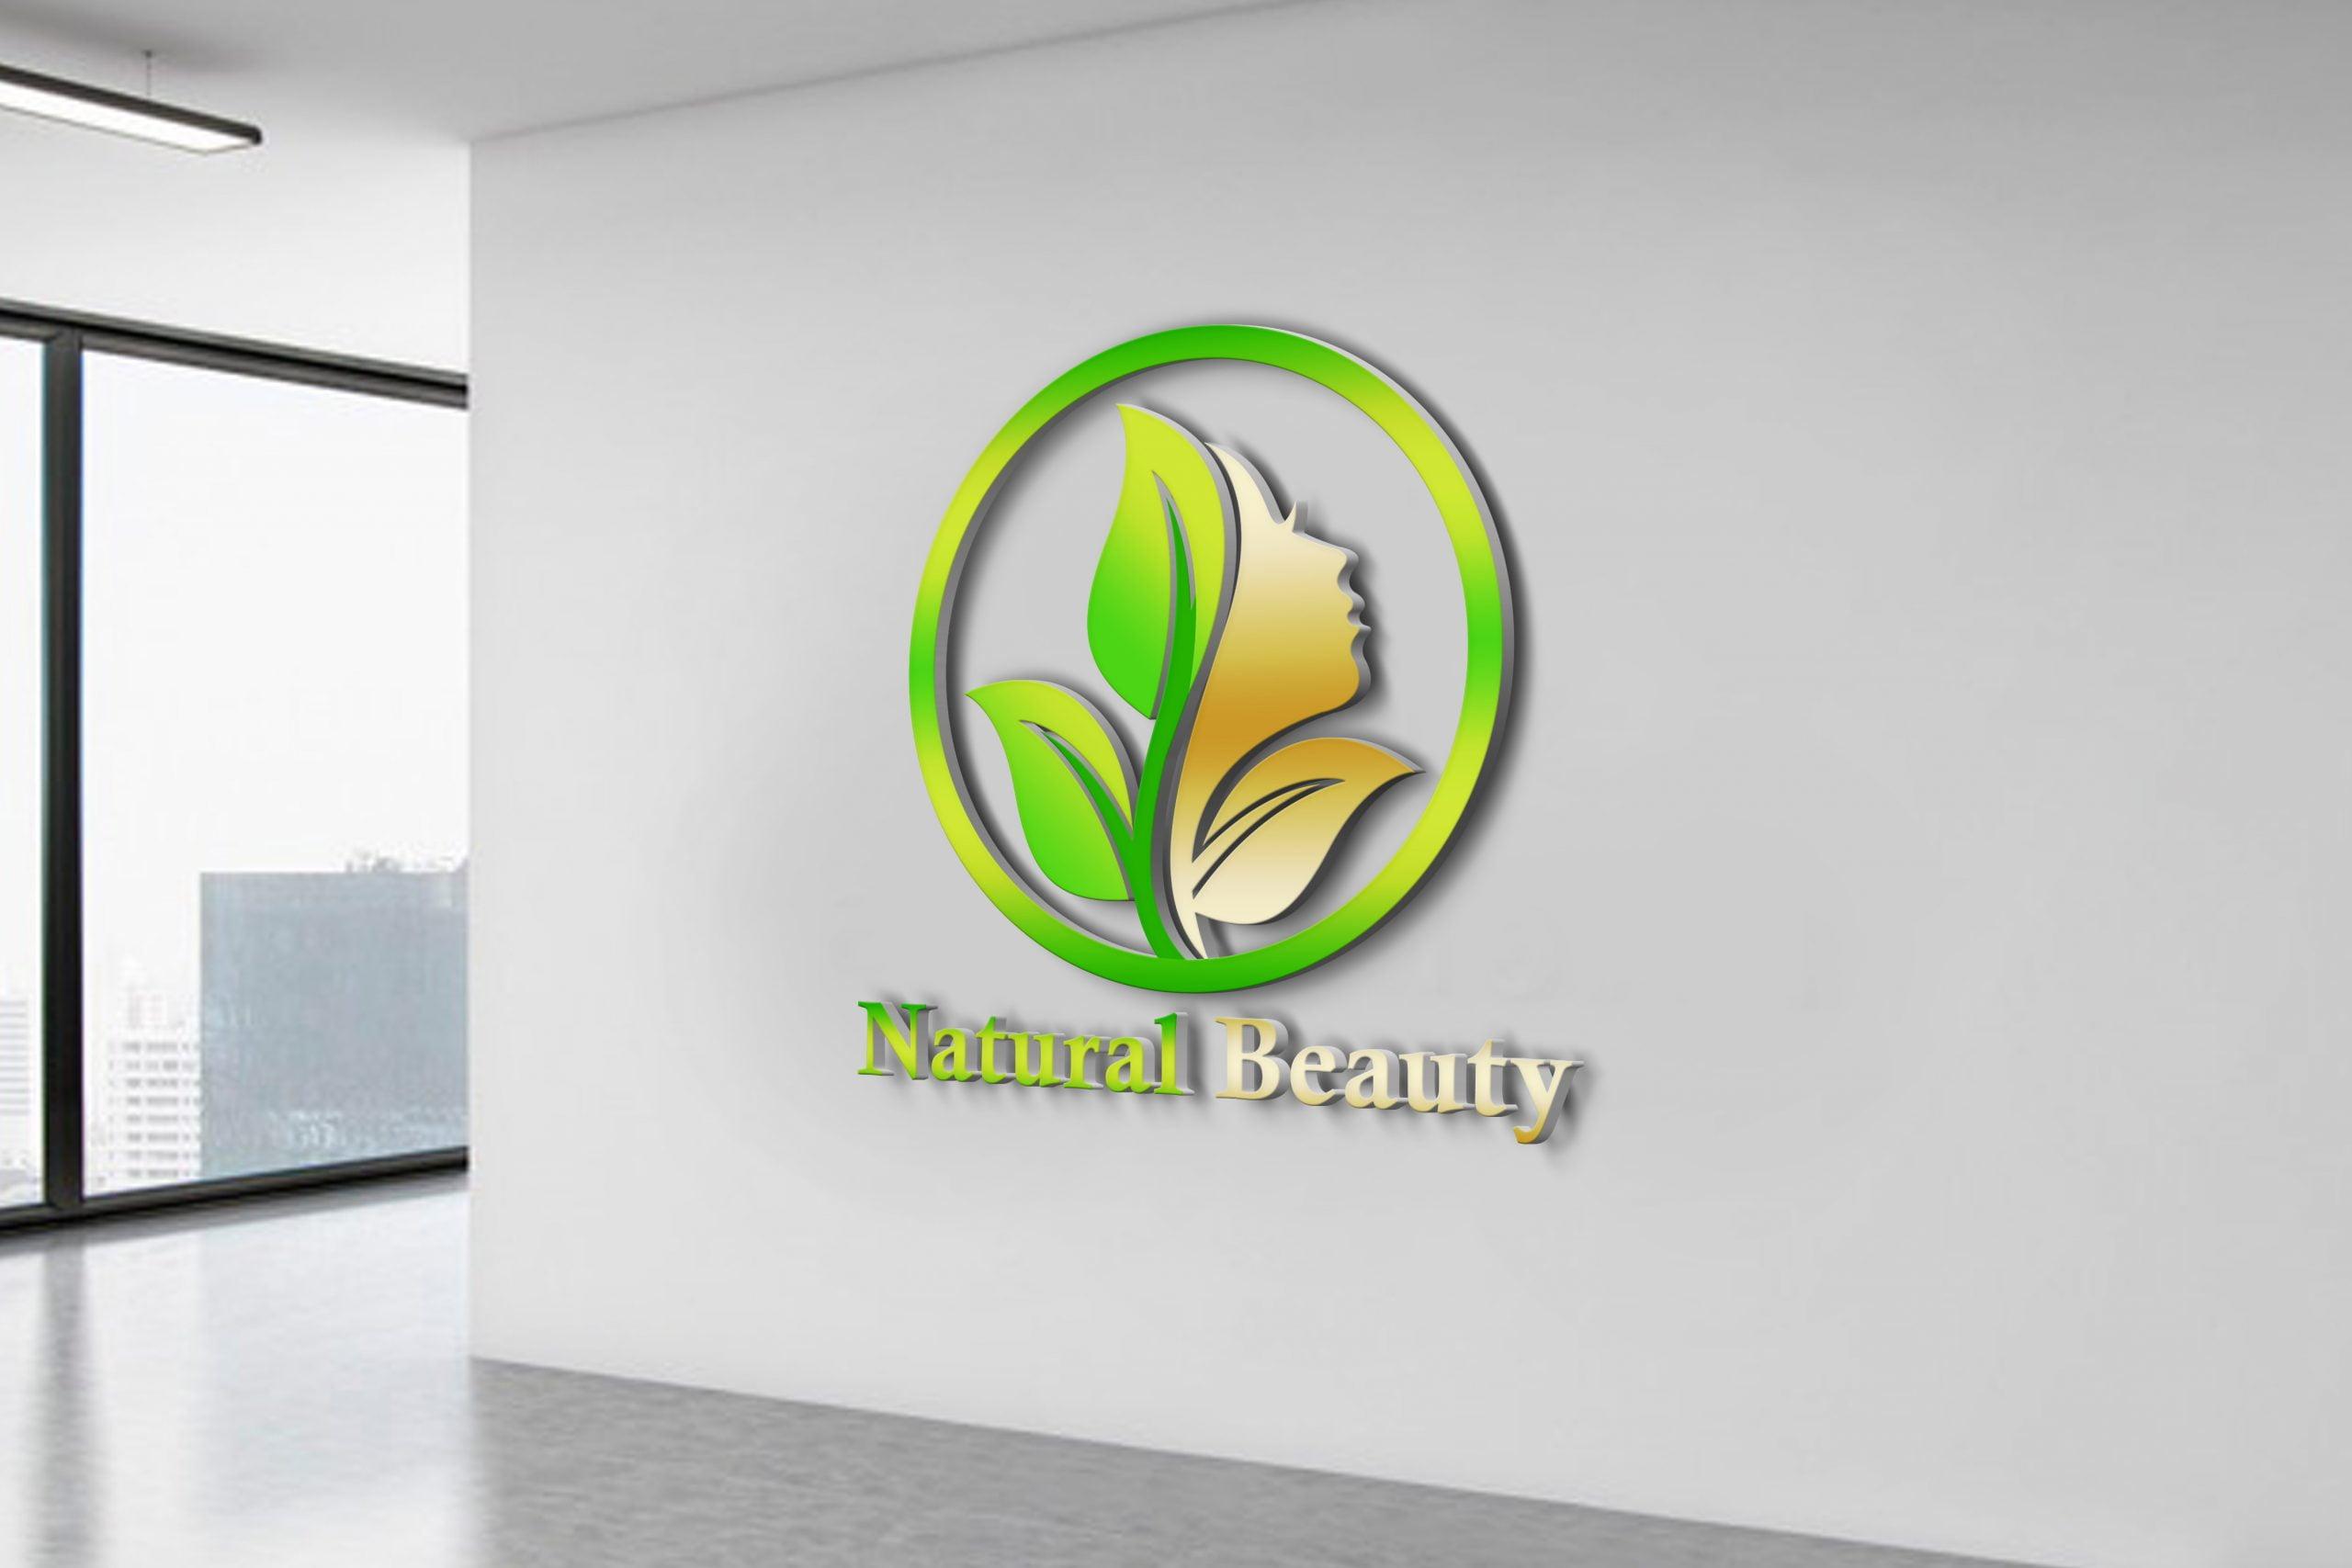 Free Download Natural Beauty Logo Design